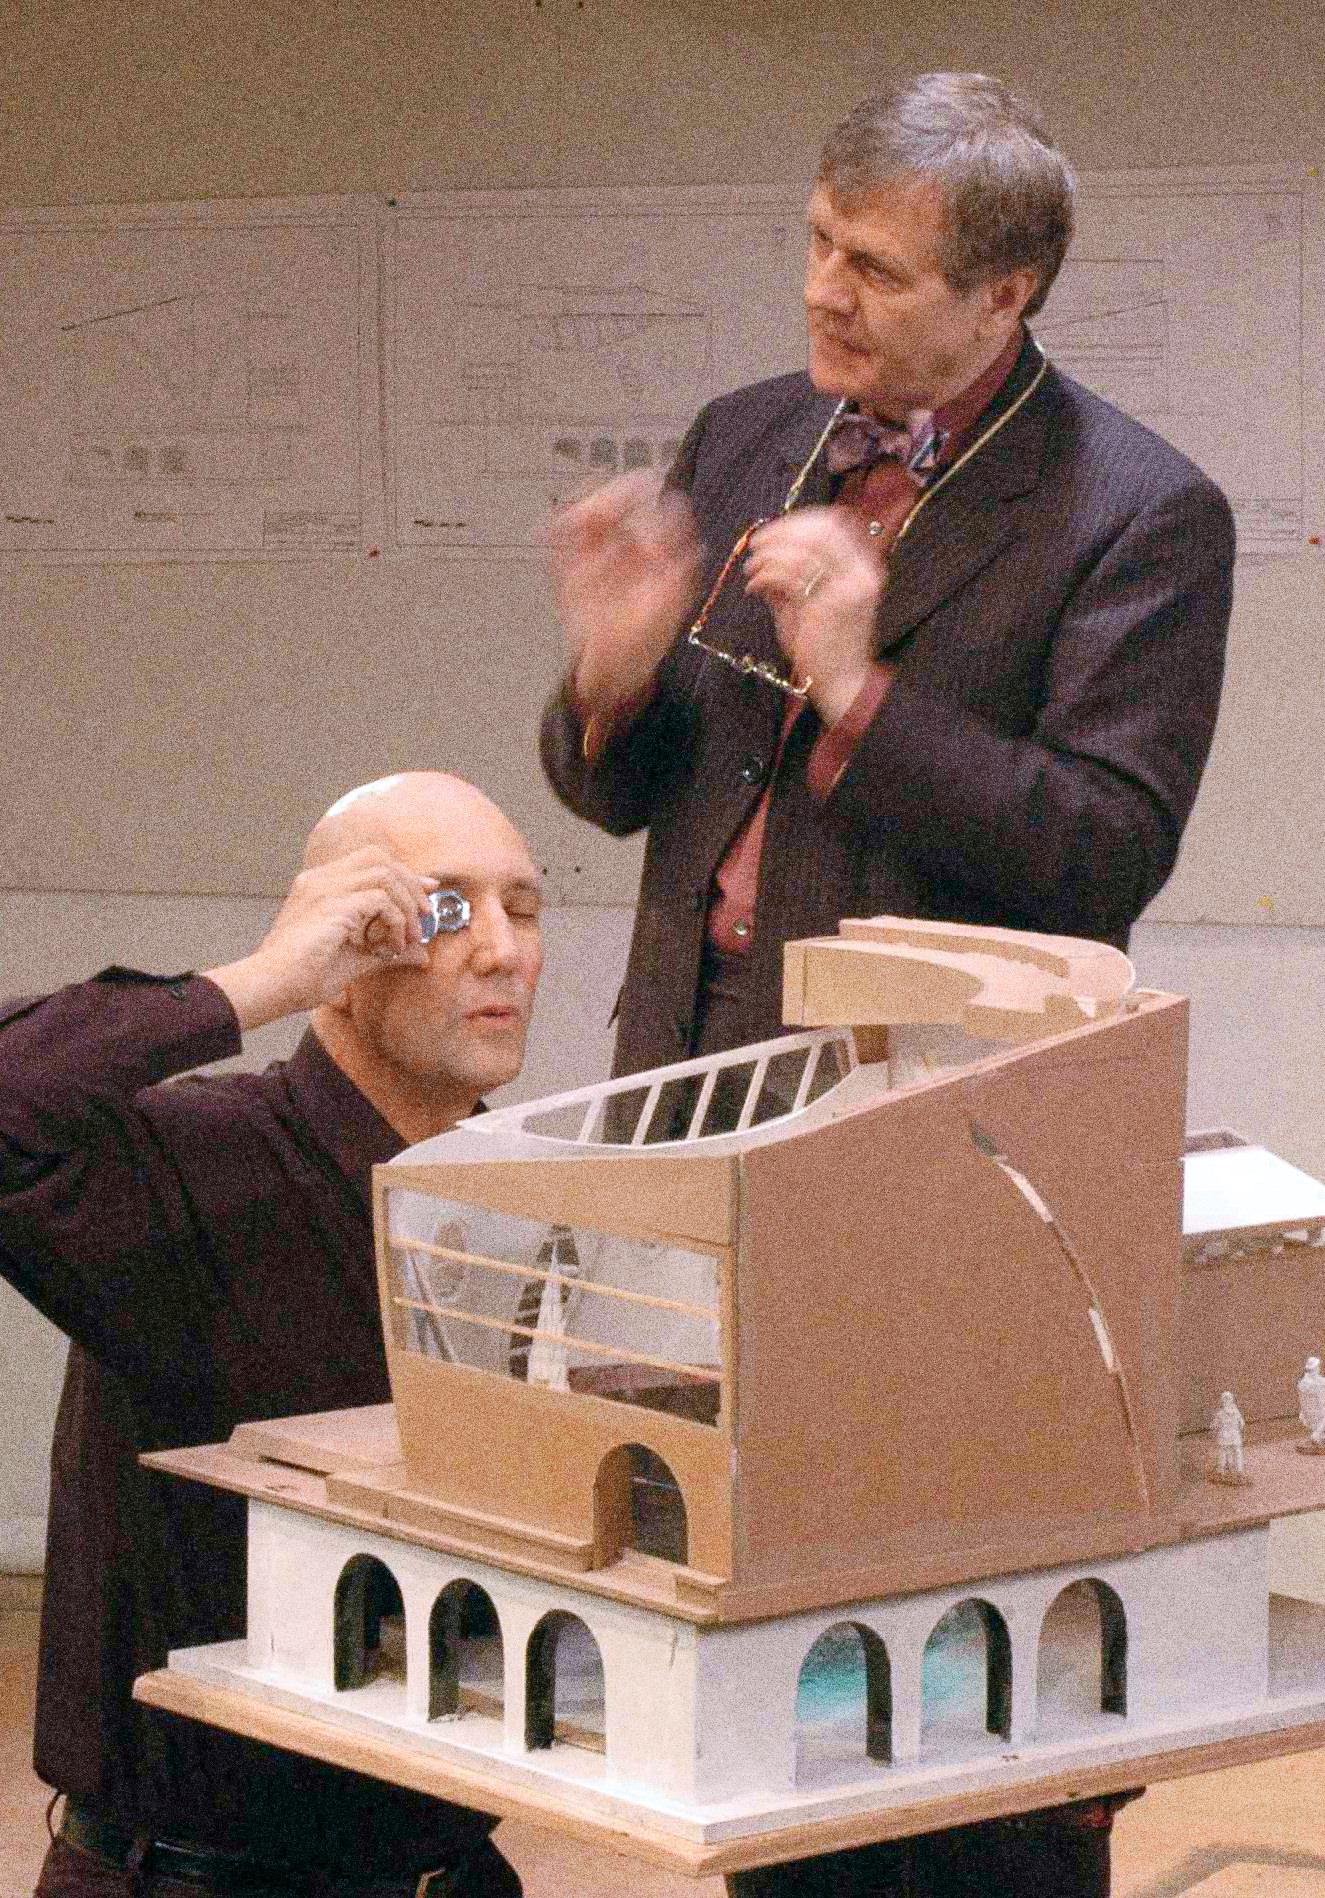 NUVO Magazine: Oren Safdie's Architecture Plays